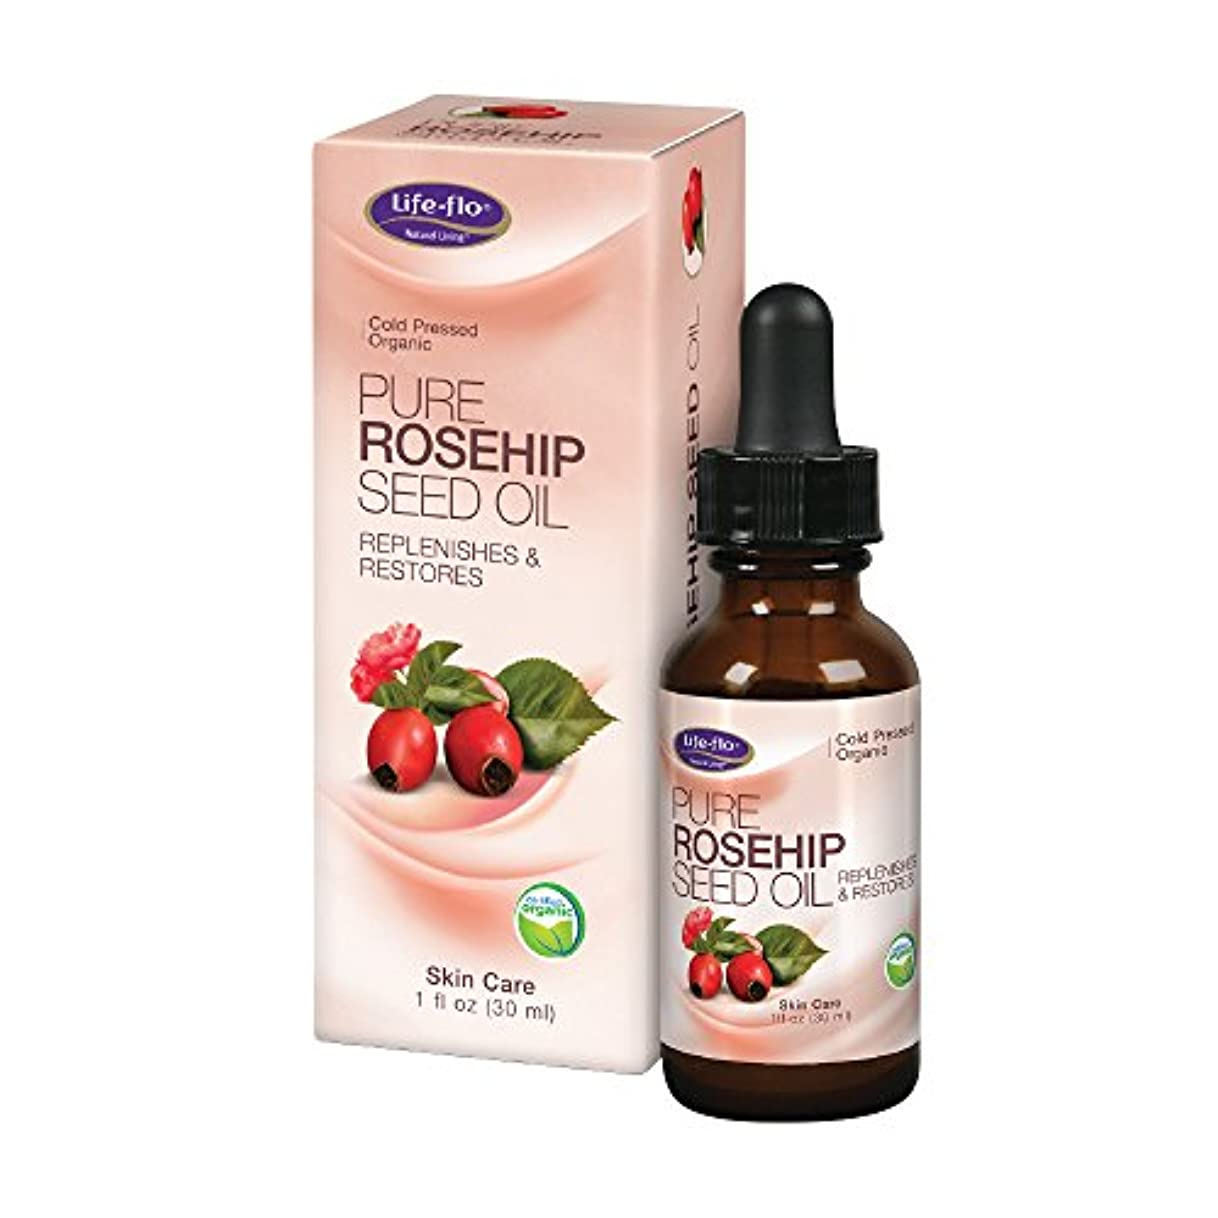 余剰効率答え海外直送品 Life-Flo Pure Rosehip Seed Oil, 1 oz